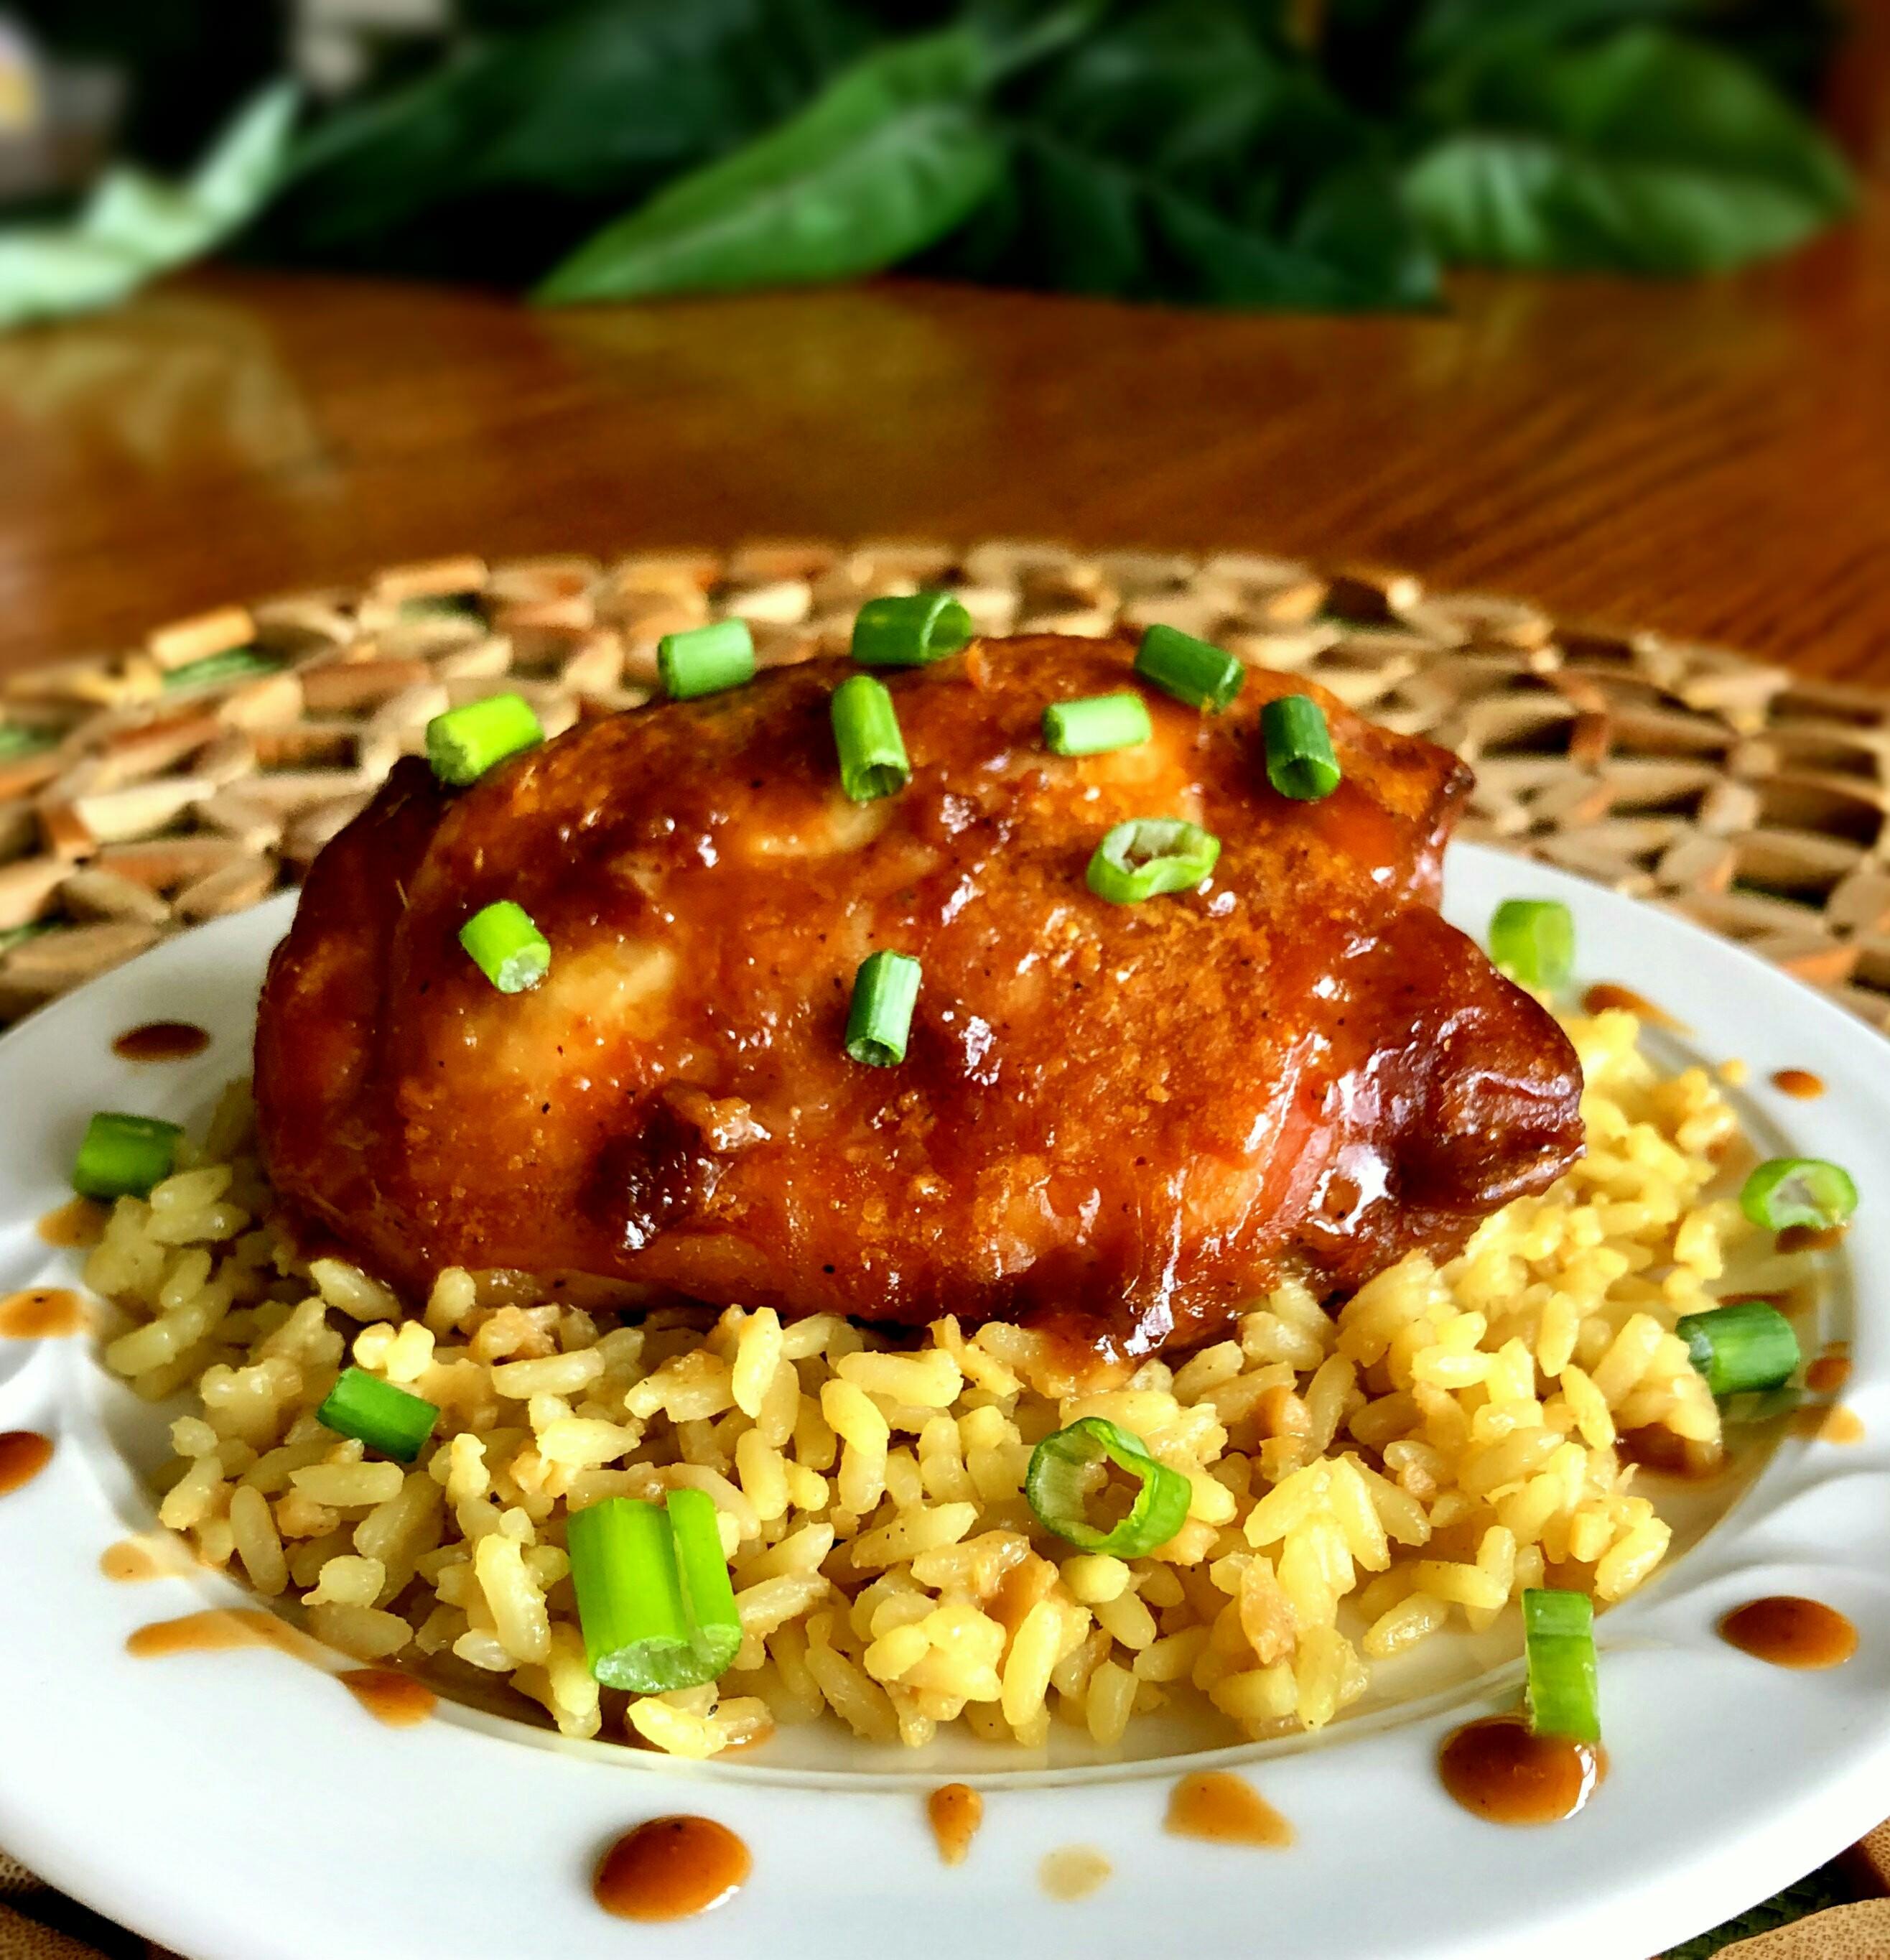 Spicy Honey-Peanut Baked Chicken Thighs